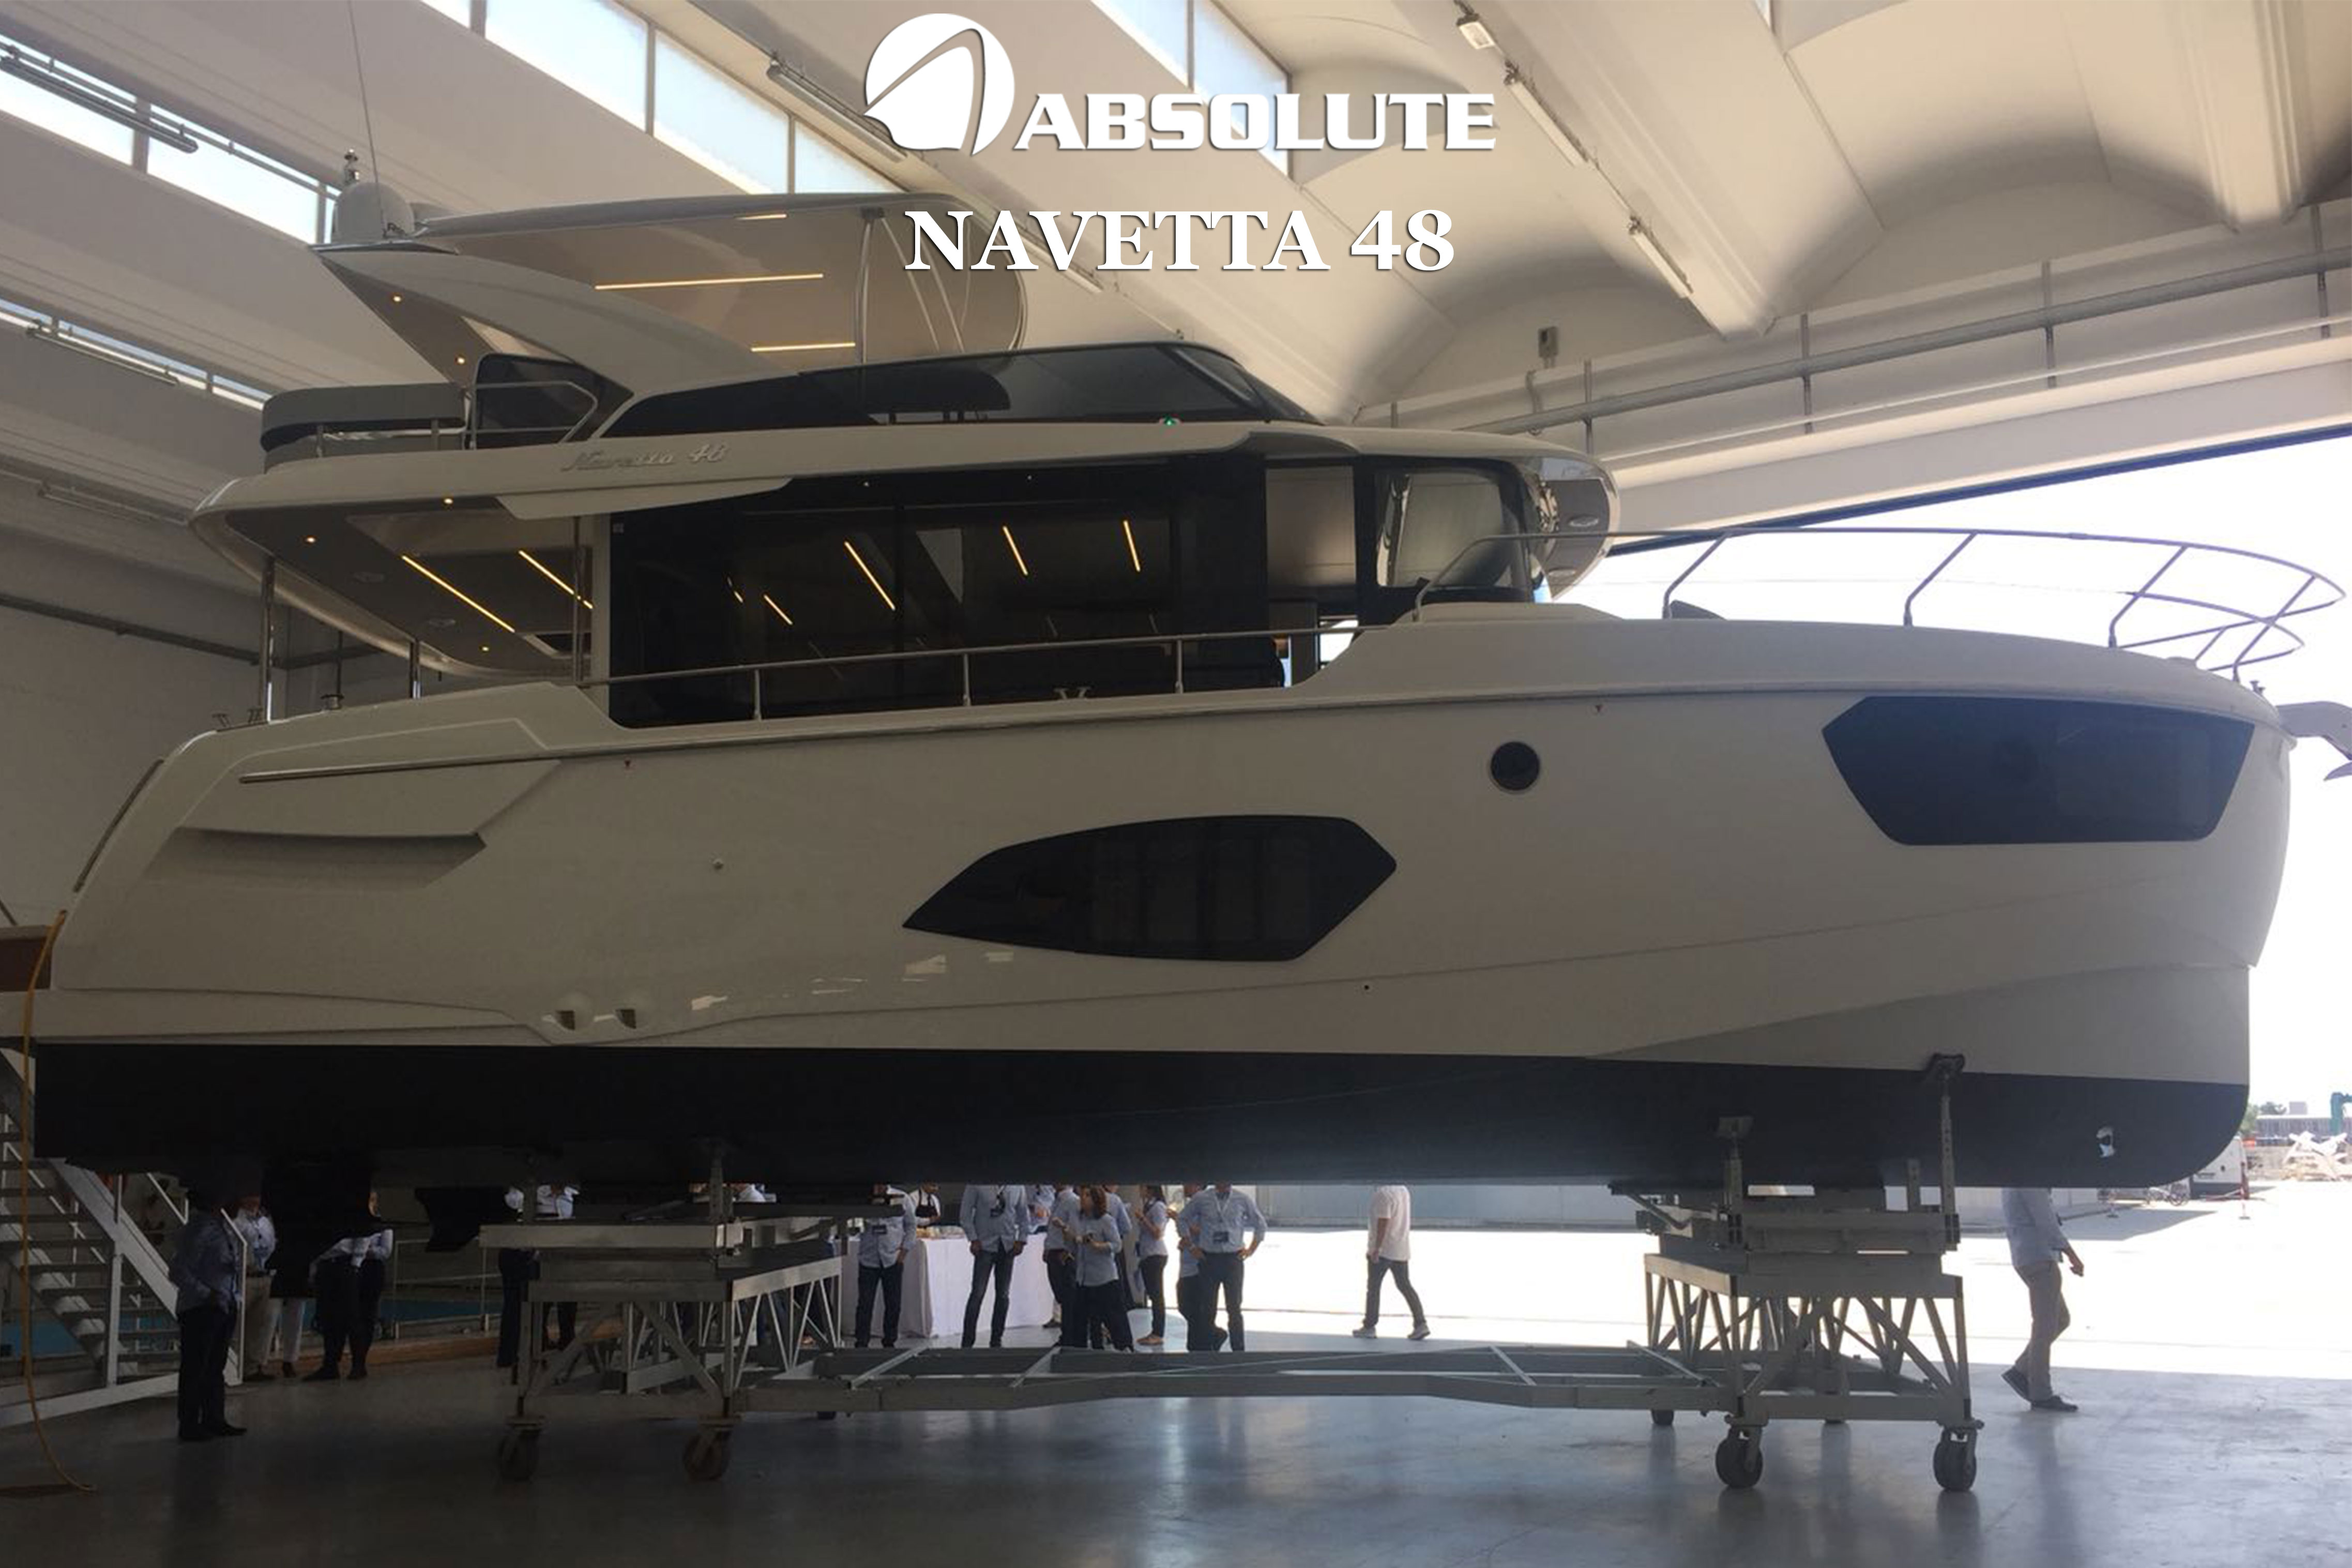 Absolute Navetta 48